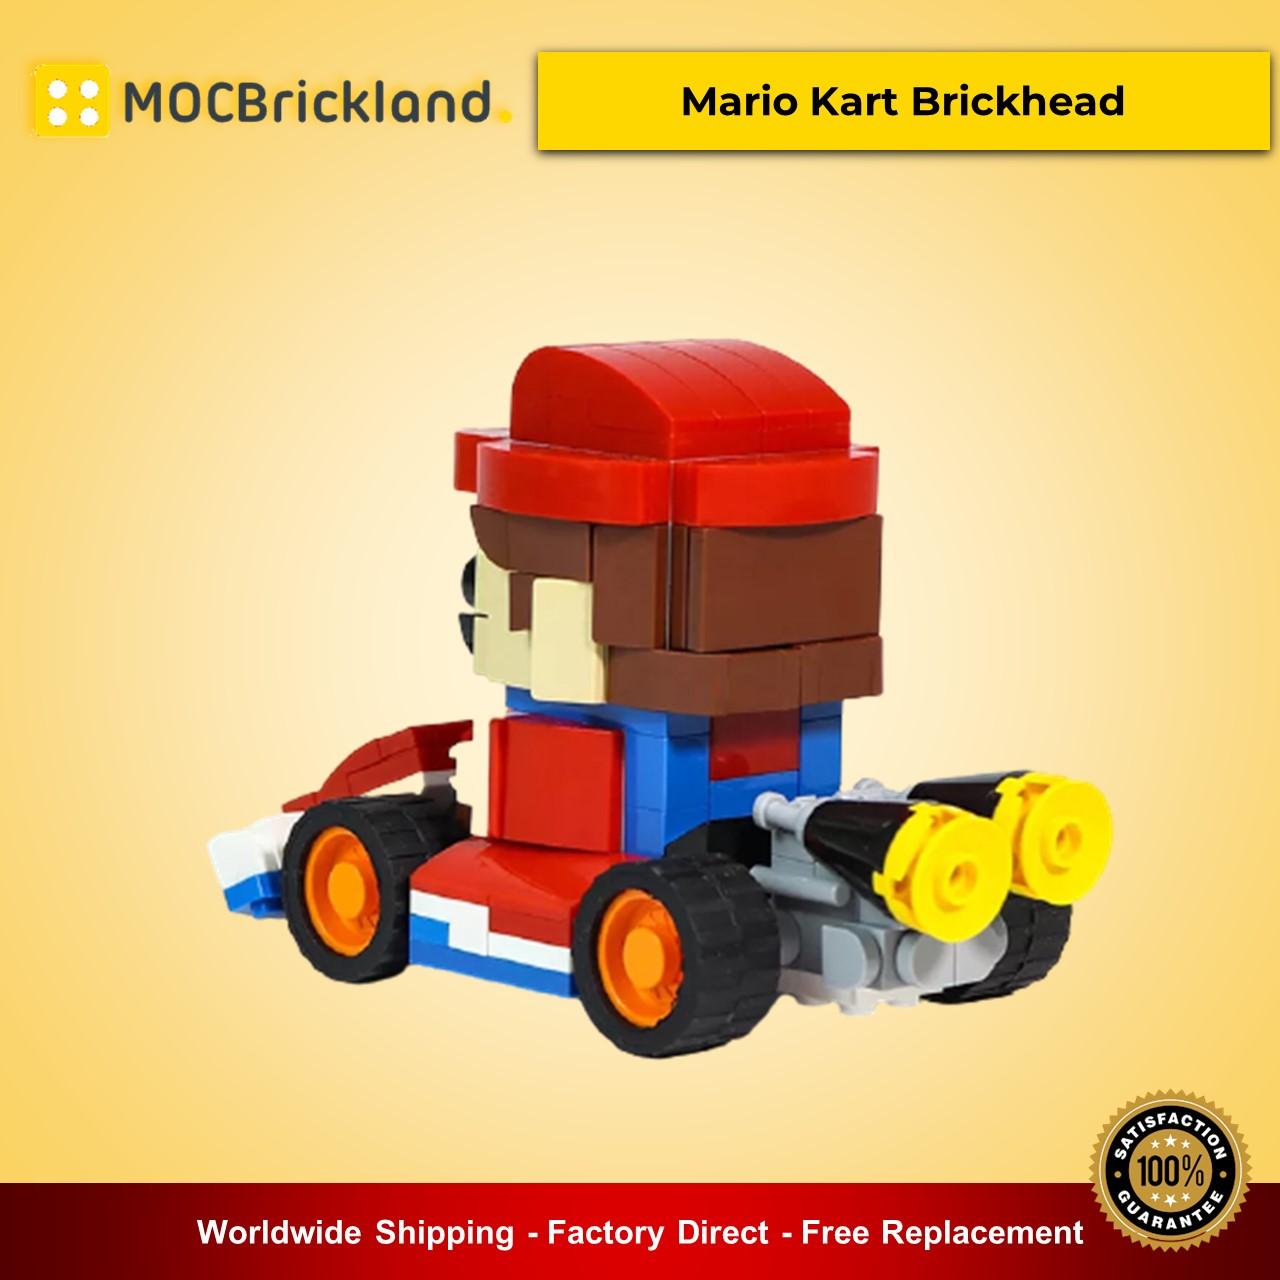 MOC-21773 Mario Kart Brickhead Movie Designed By VNMBricks With 241 Pieces